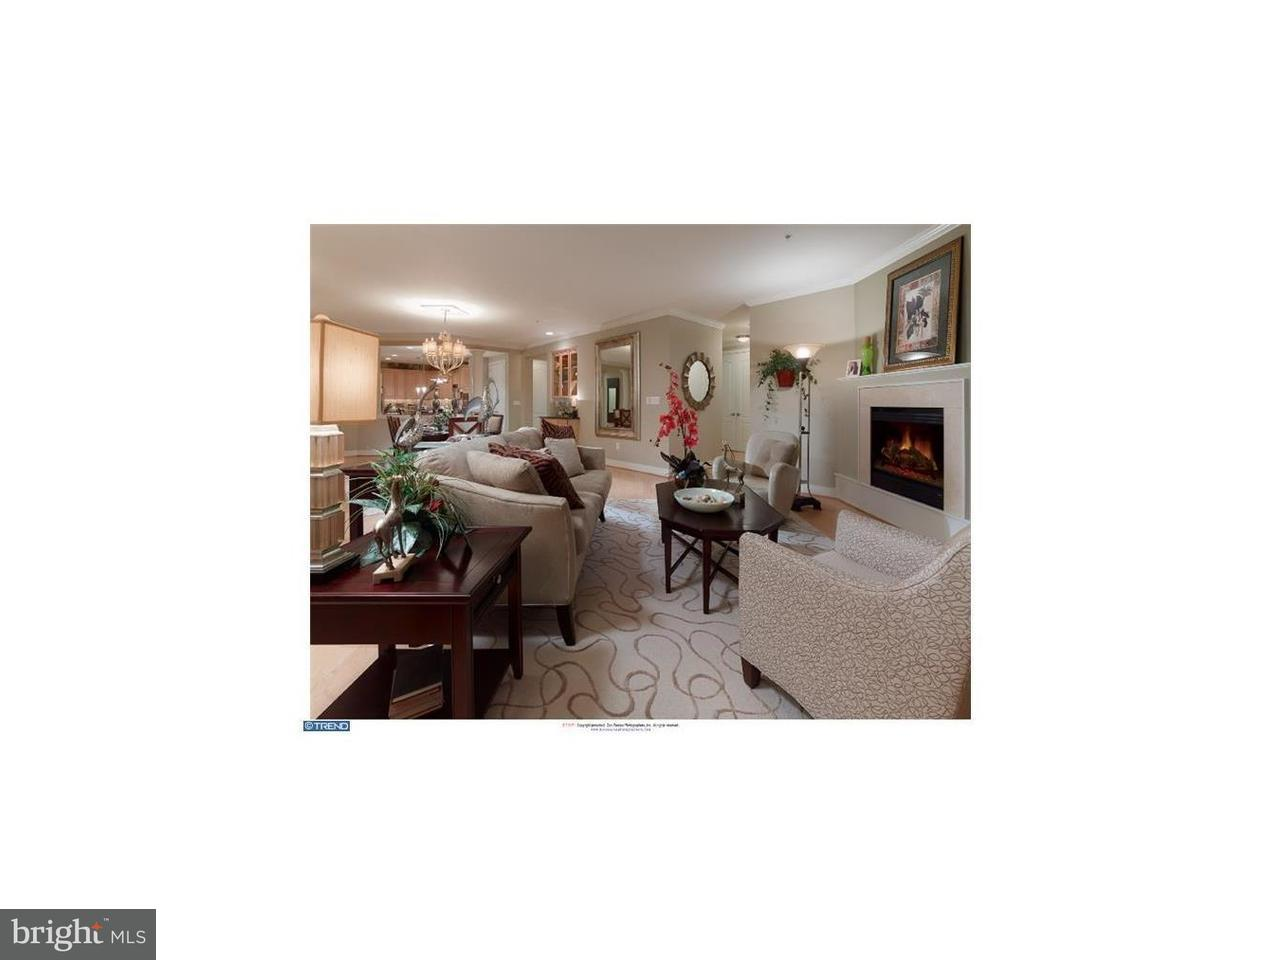 Single Family Home for Sale at 1106 MERIDIAN BLVD Warrington, Pennsylvania 18976 United States